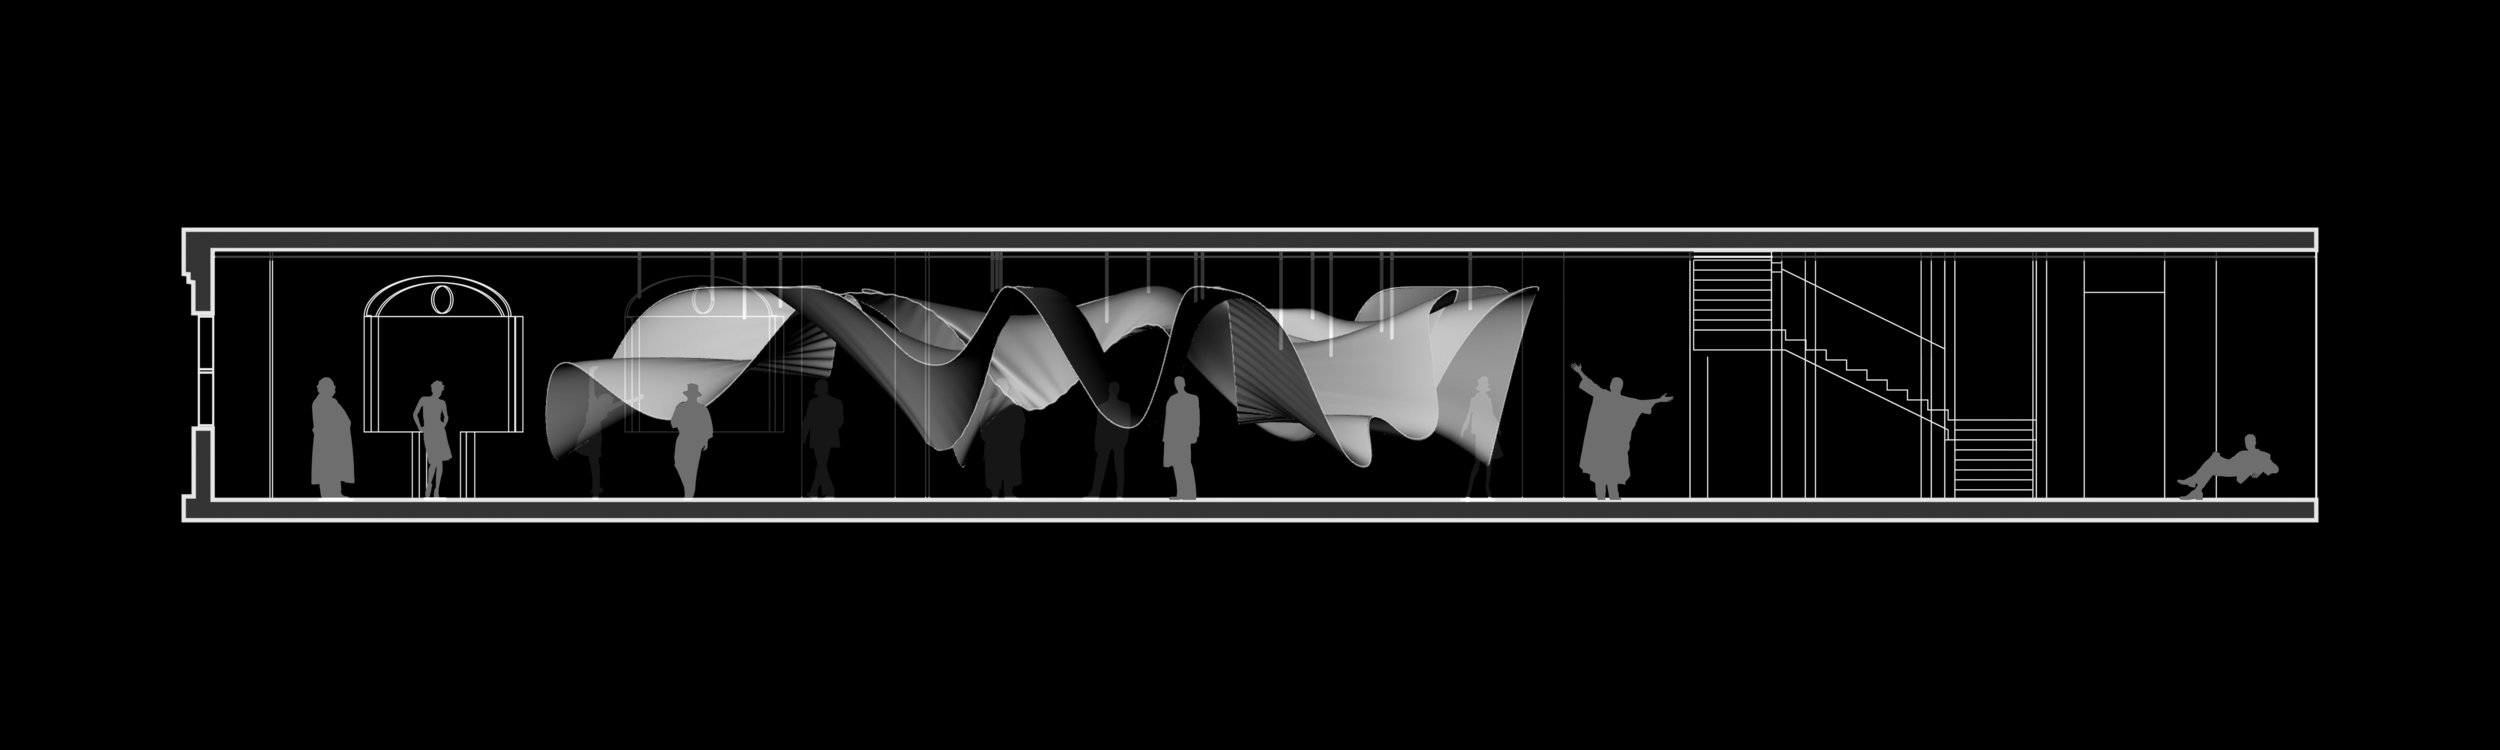 SPANS associates - The Seduction Pavilion - Unfammous stars - Marylin Monroe - 3D printing - Diagramme 22.jpg